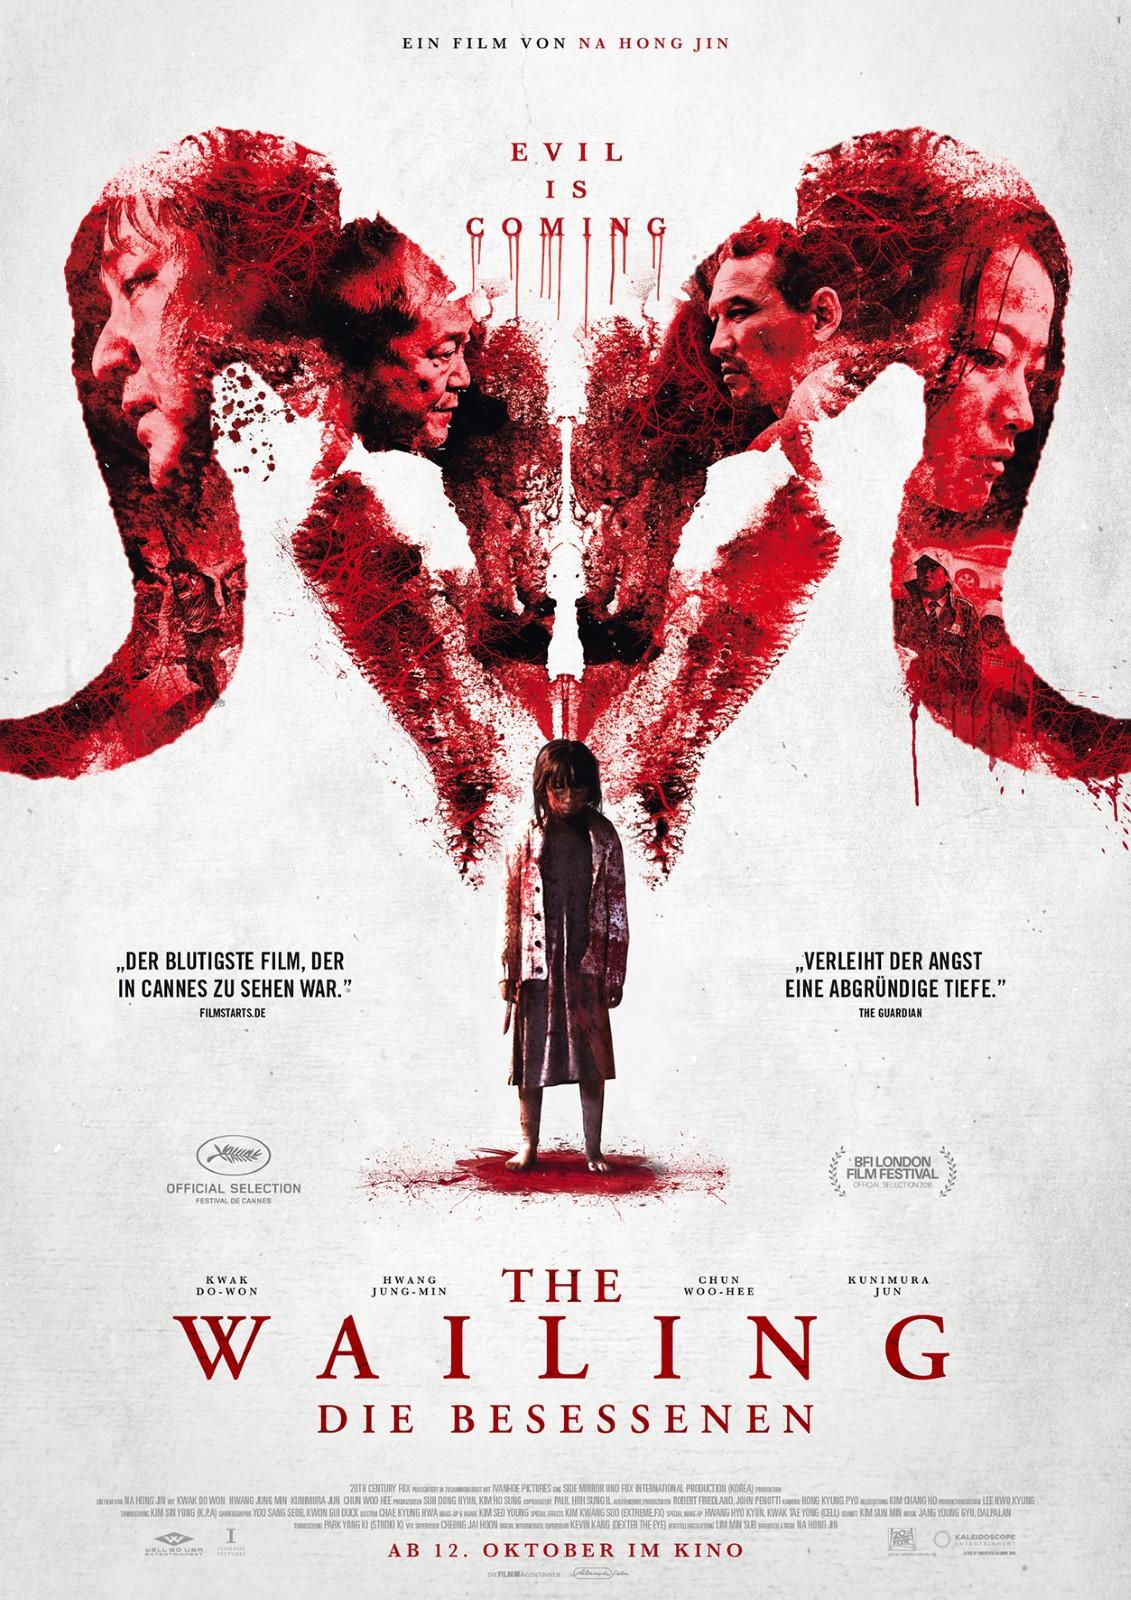 The Wailing: Die Besessenen